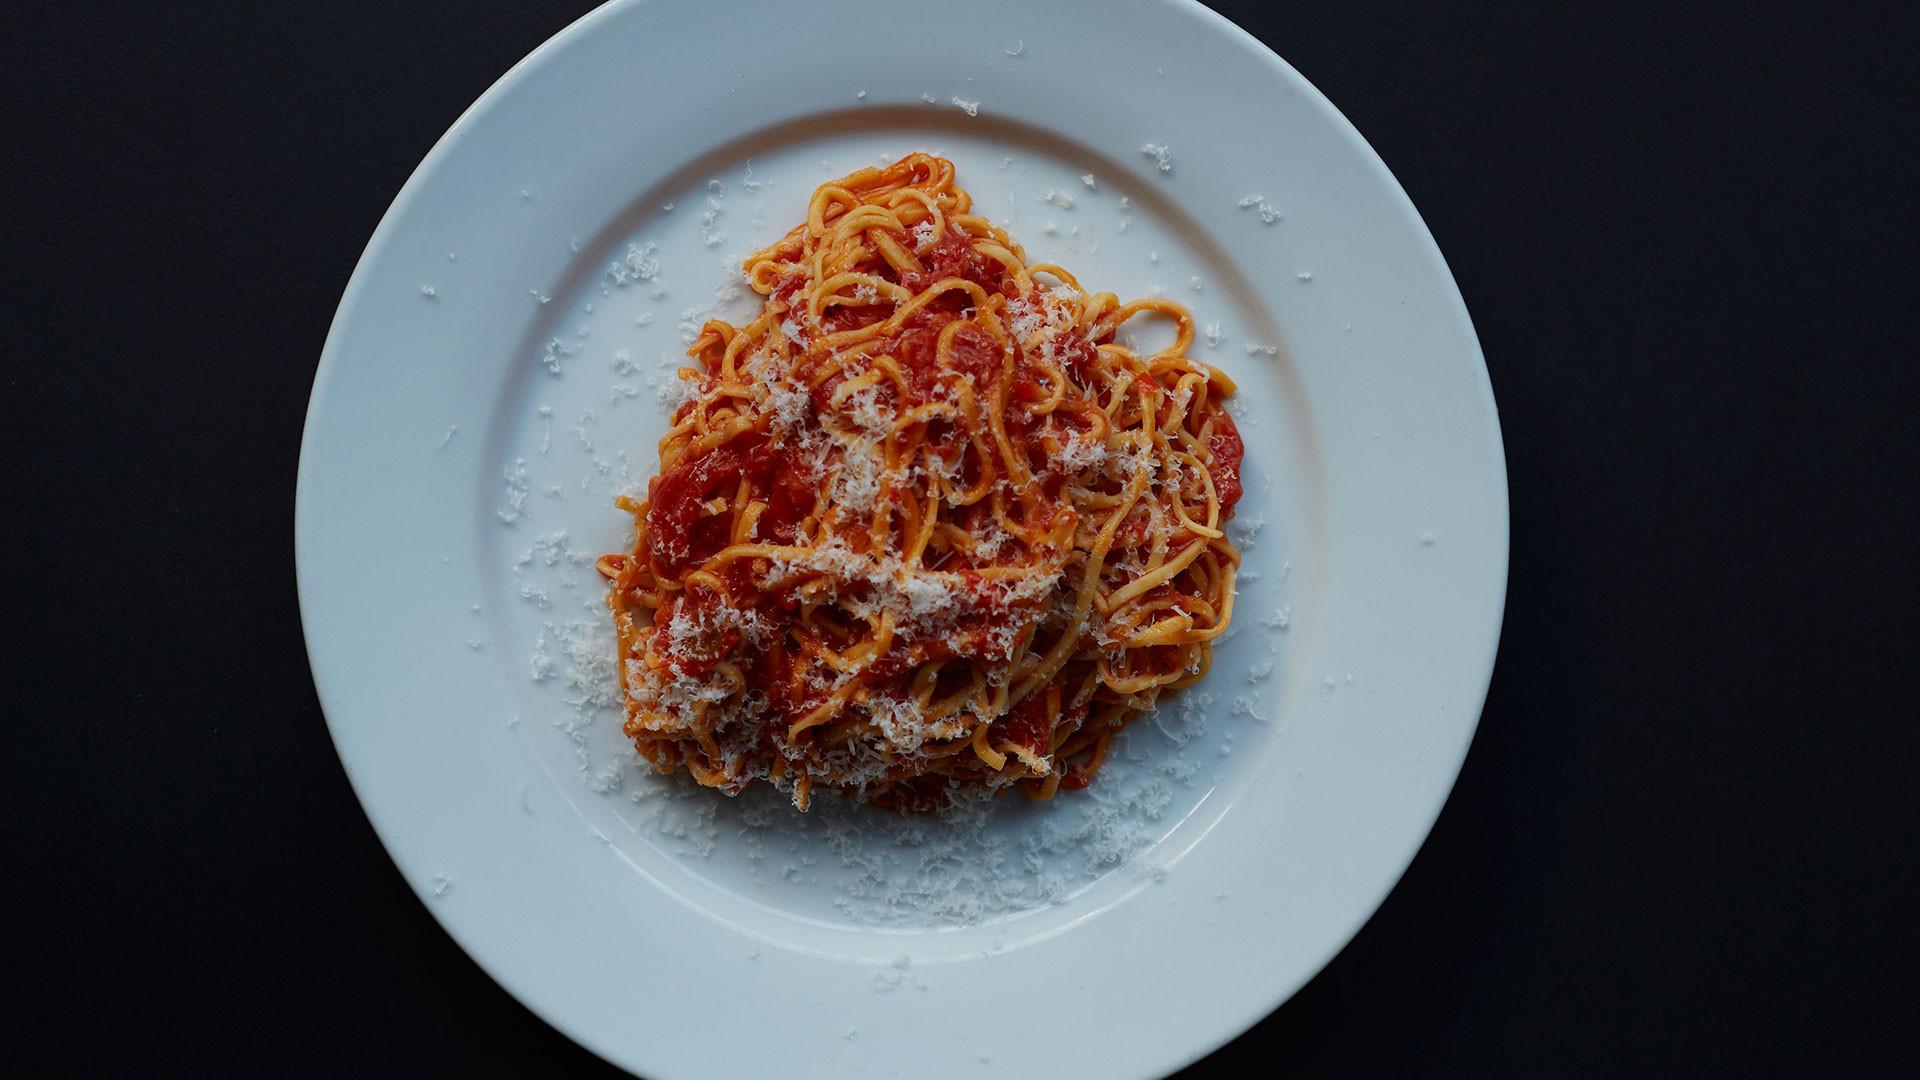 Tagliarini with tomato sauce